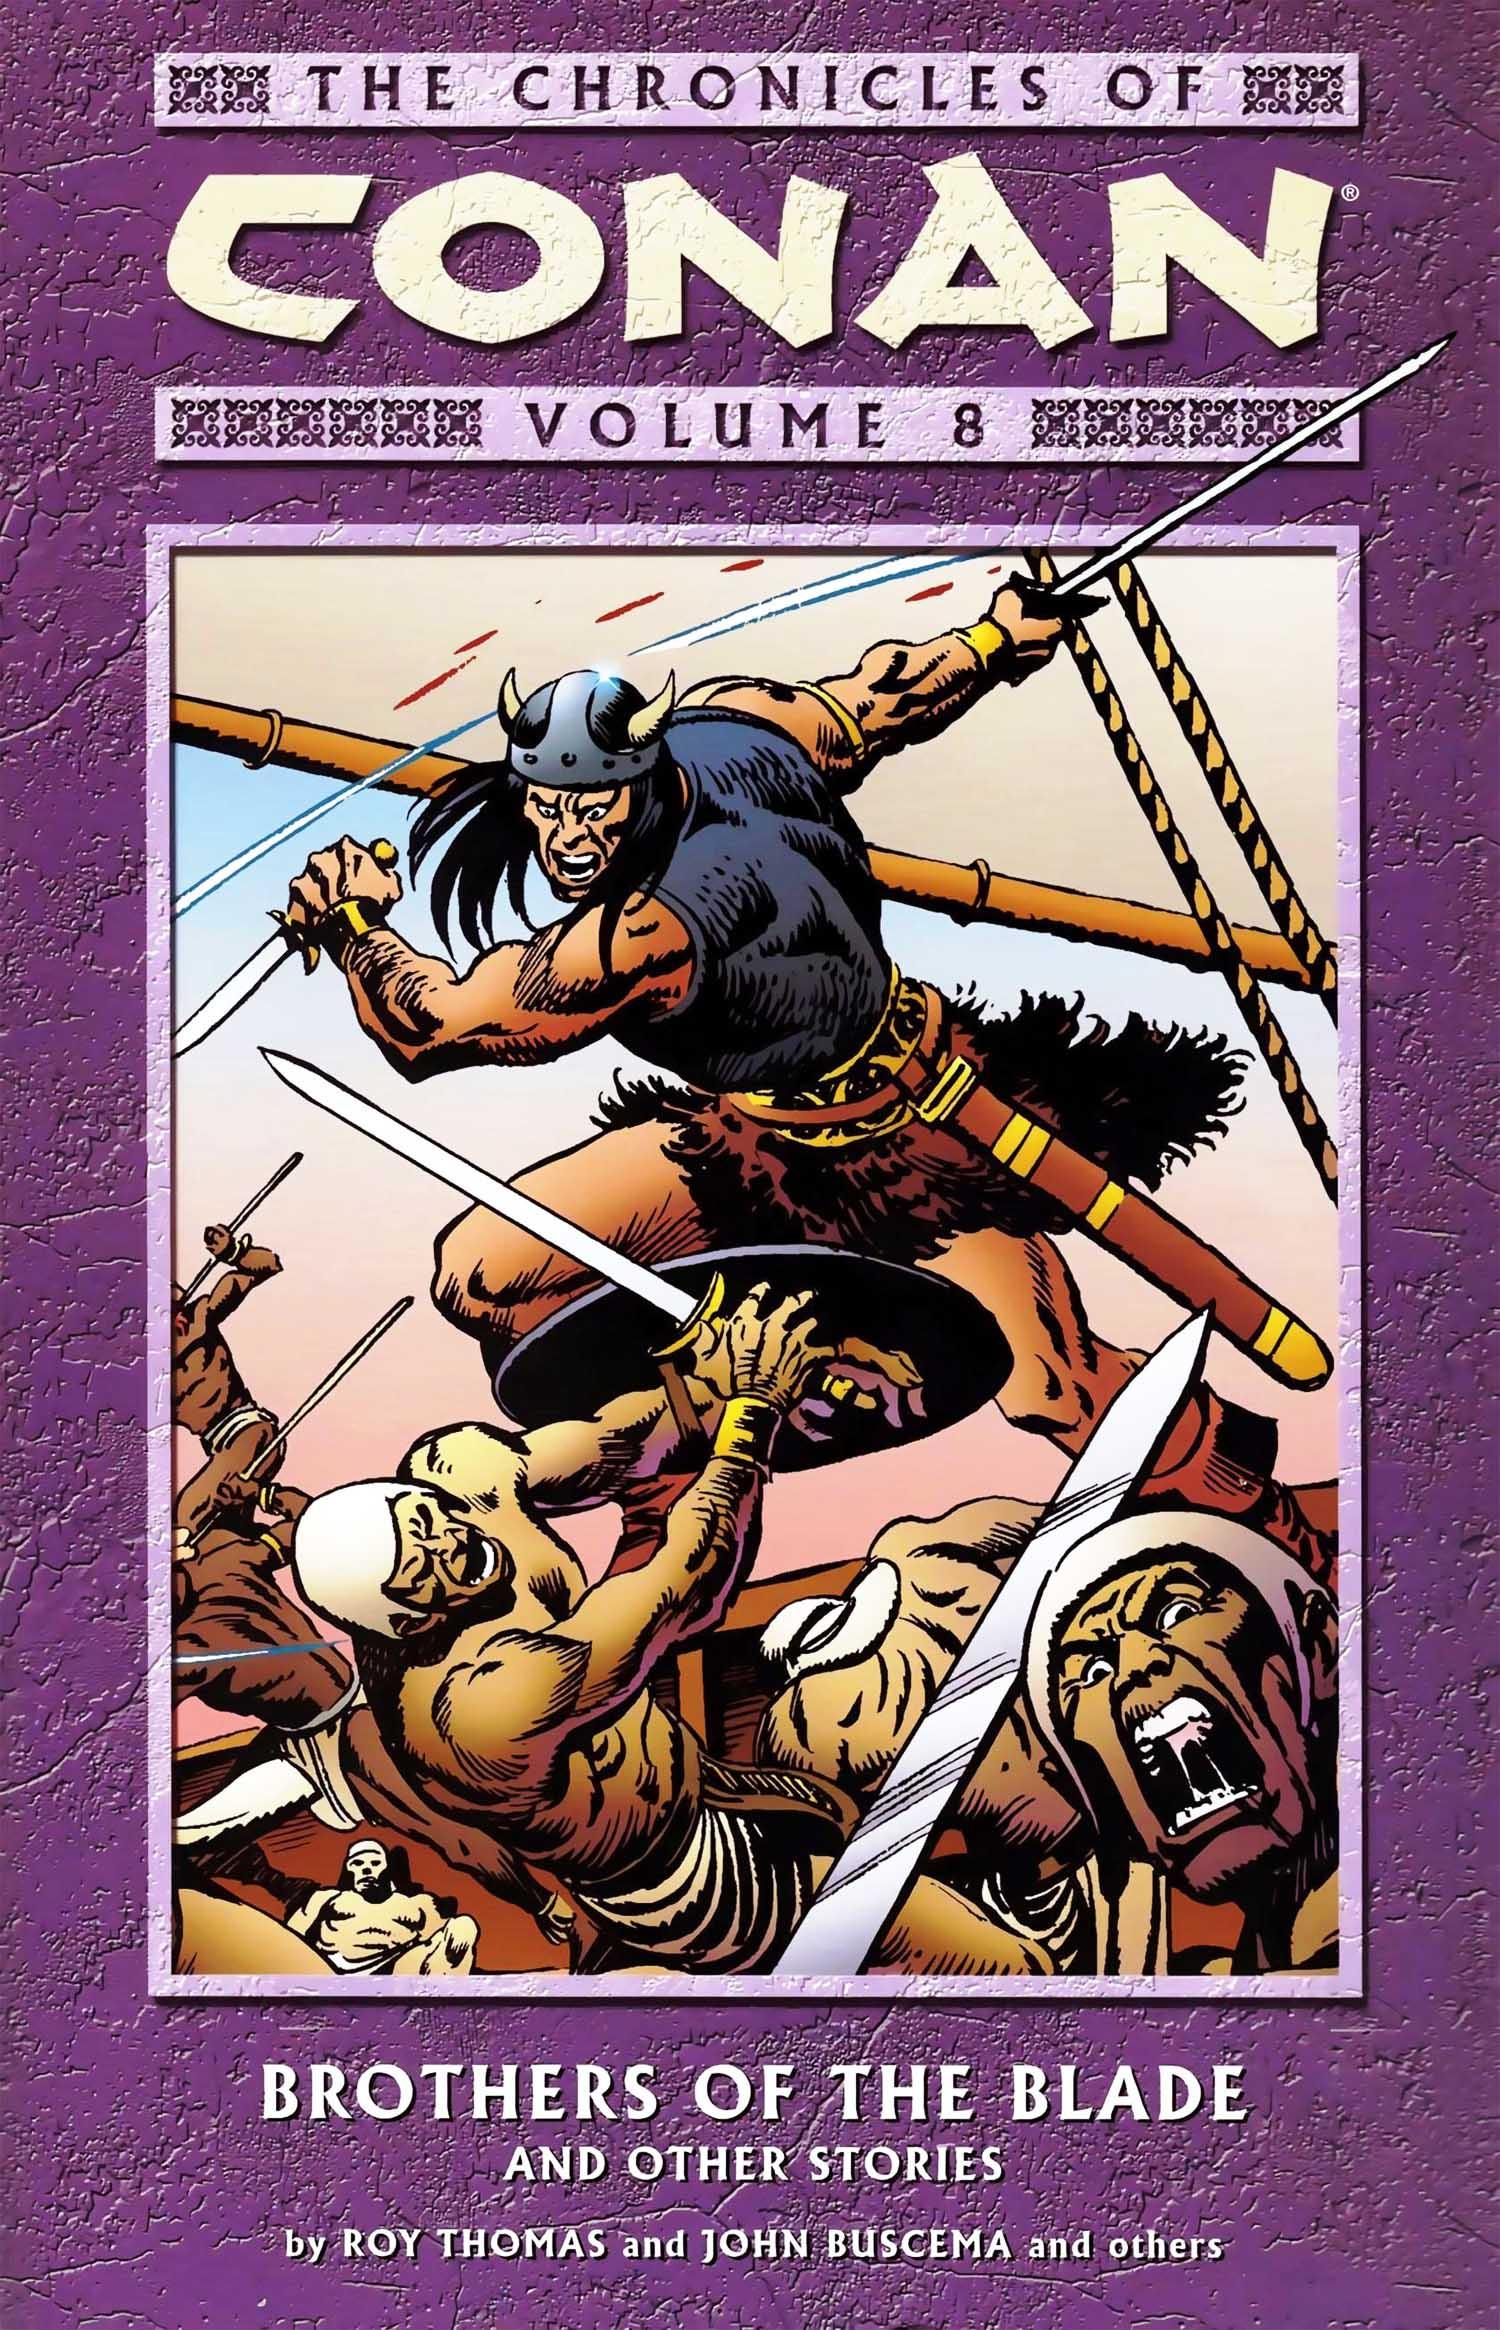 The Chronicles of Conan Volume 8